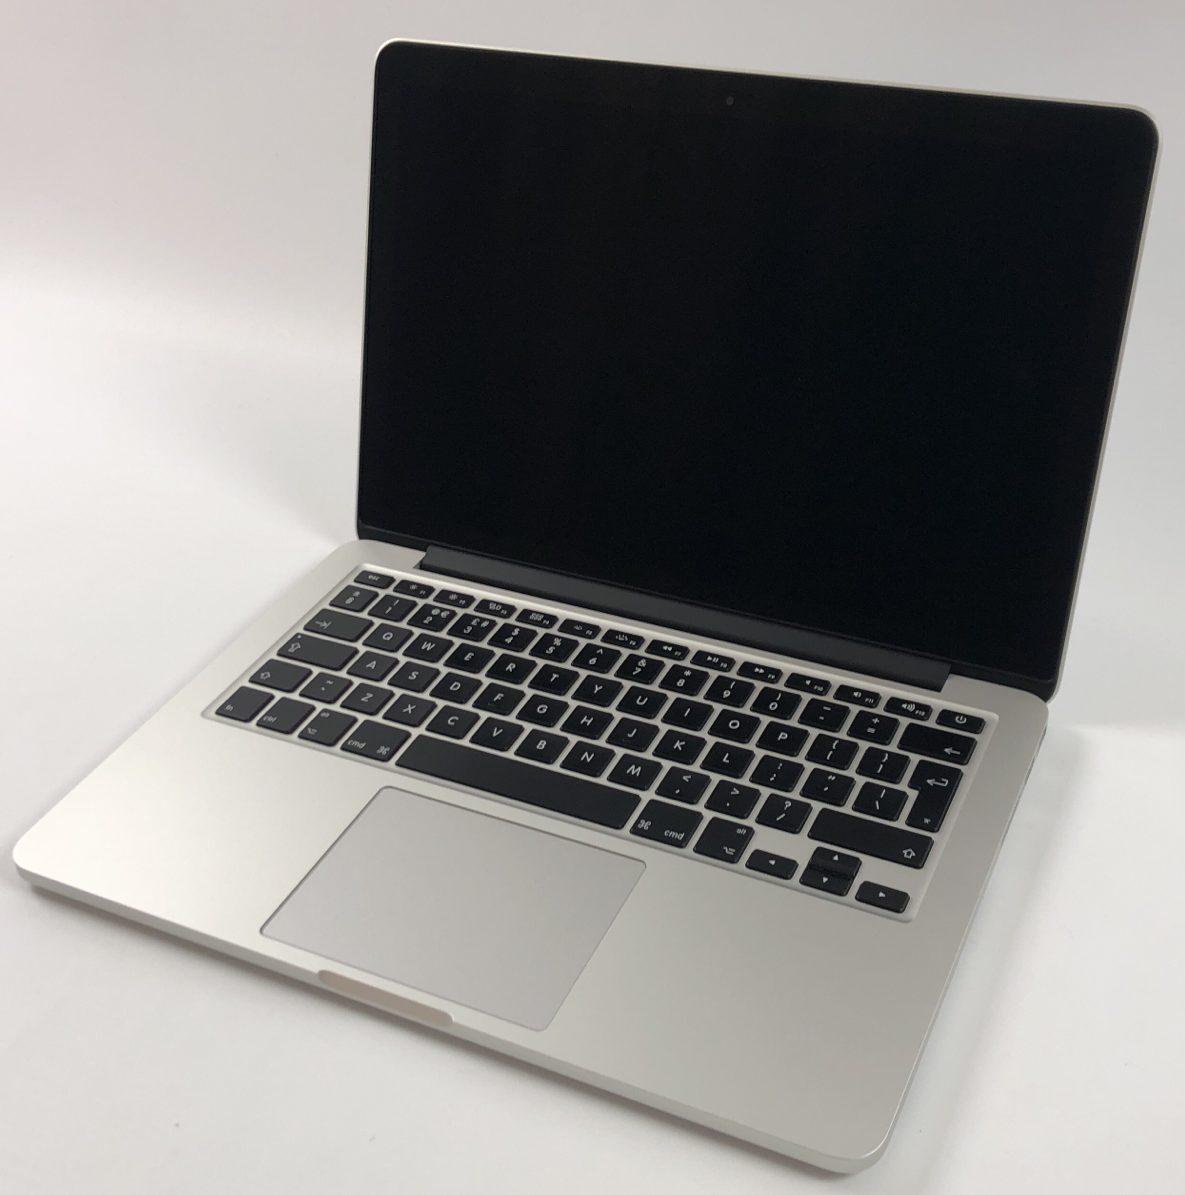 "MacBook Pro Retina 13"" Early 2015 (Intel Core i5 2.9 GHz 8 GB RAM 512 GB SSD), Intel Core i5 2.9 GHz, 8 GB RAM, 512 GB SSD, image 1"